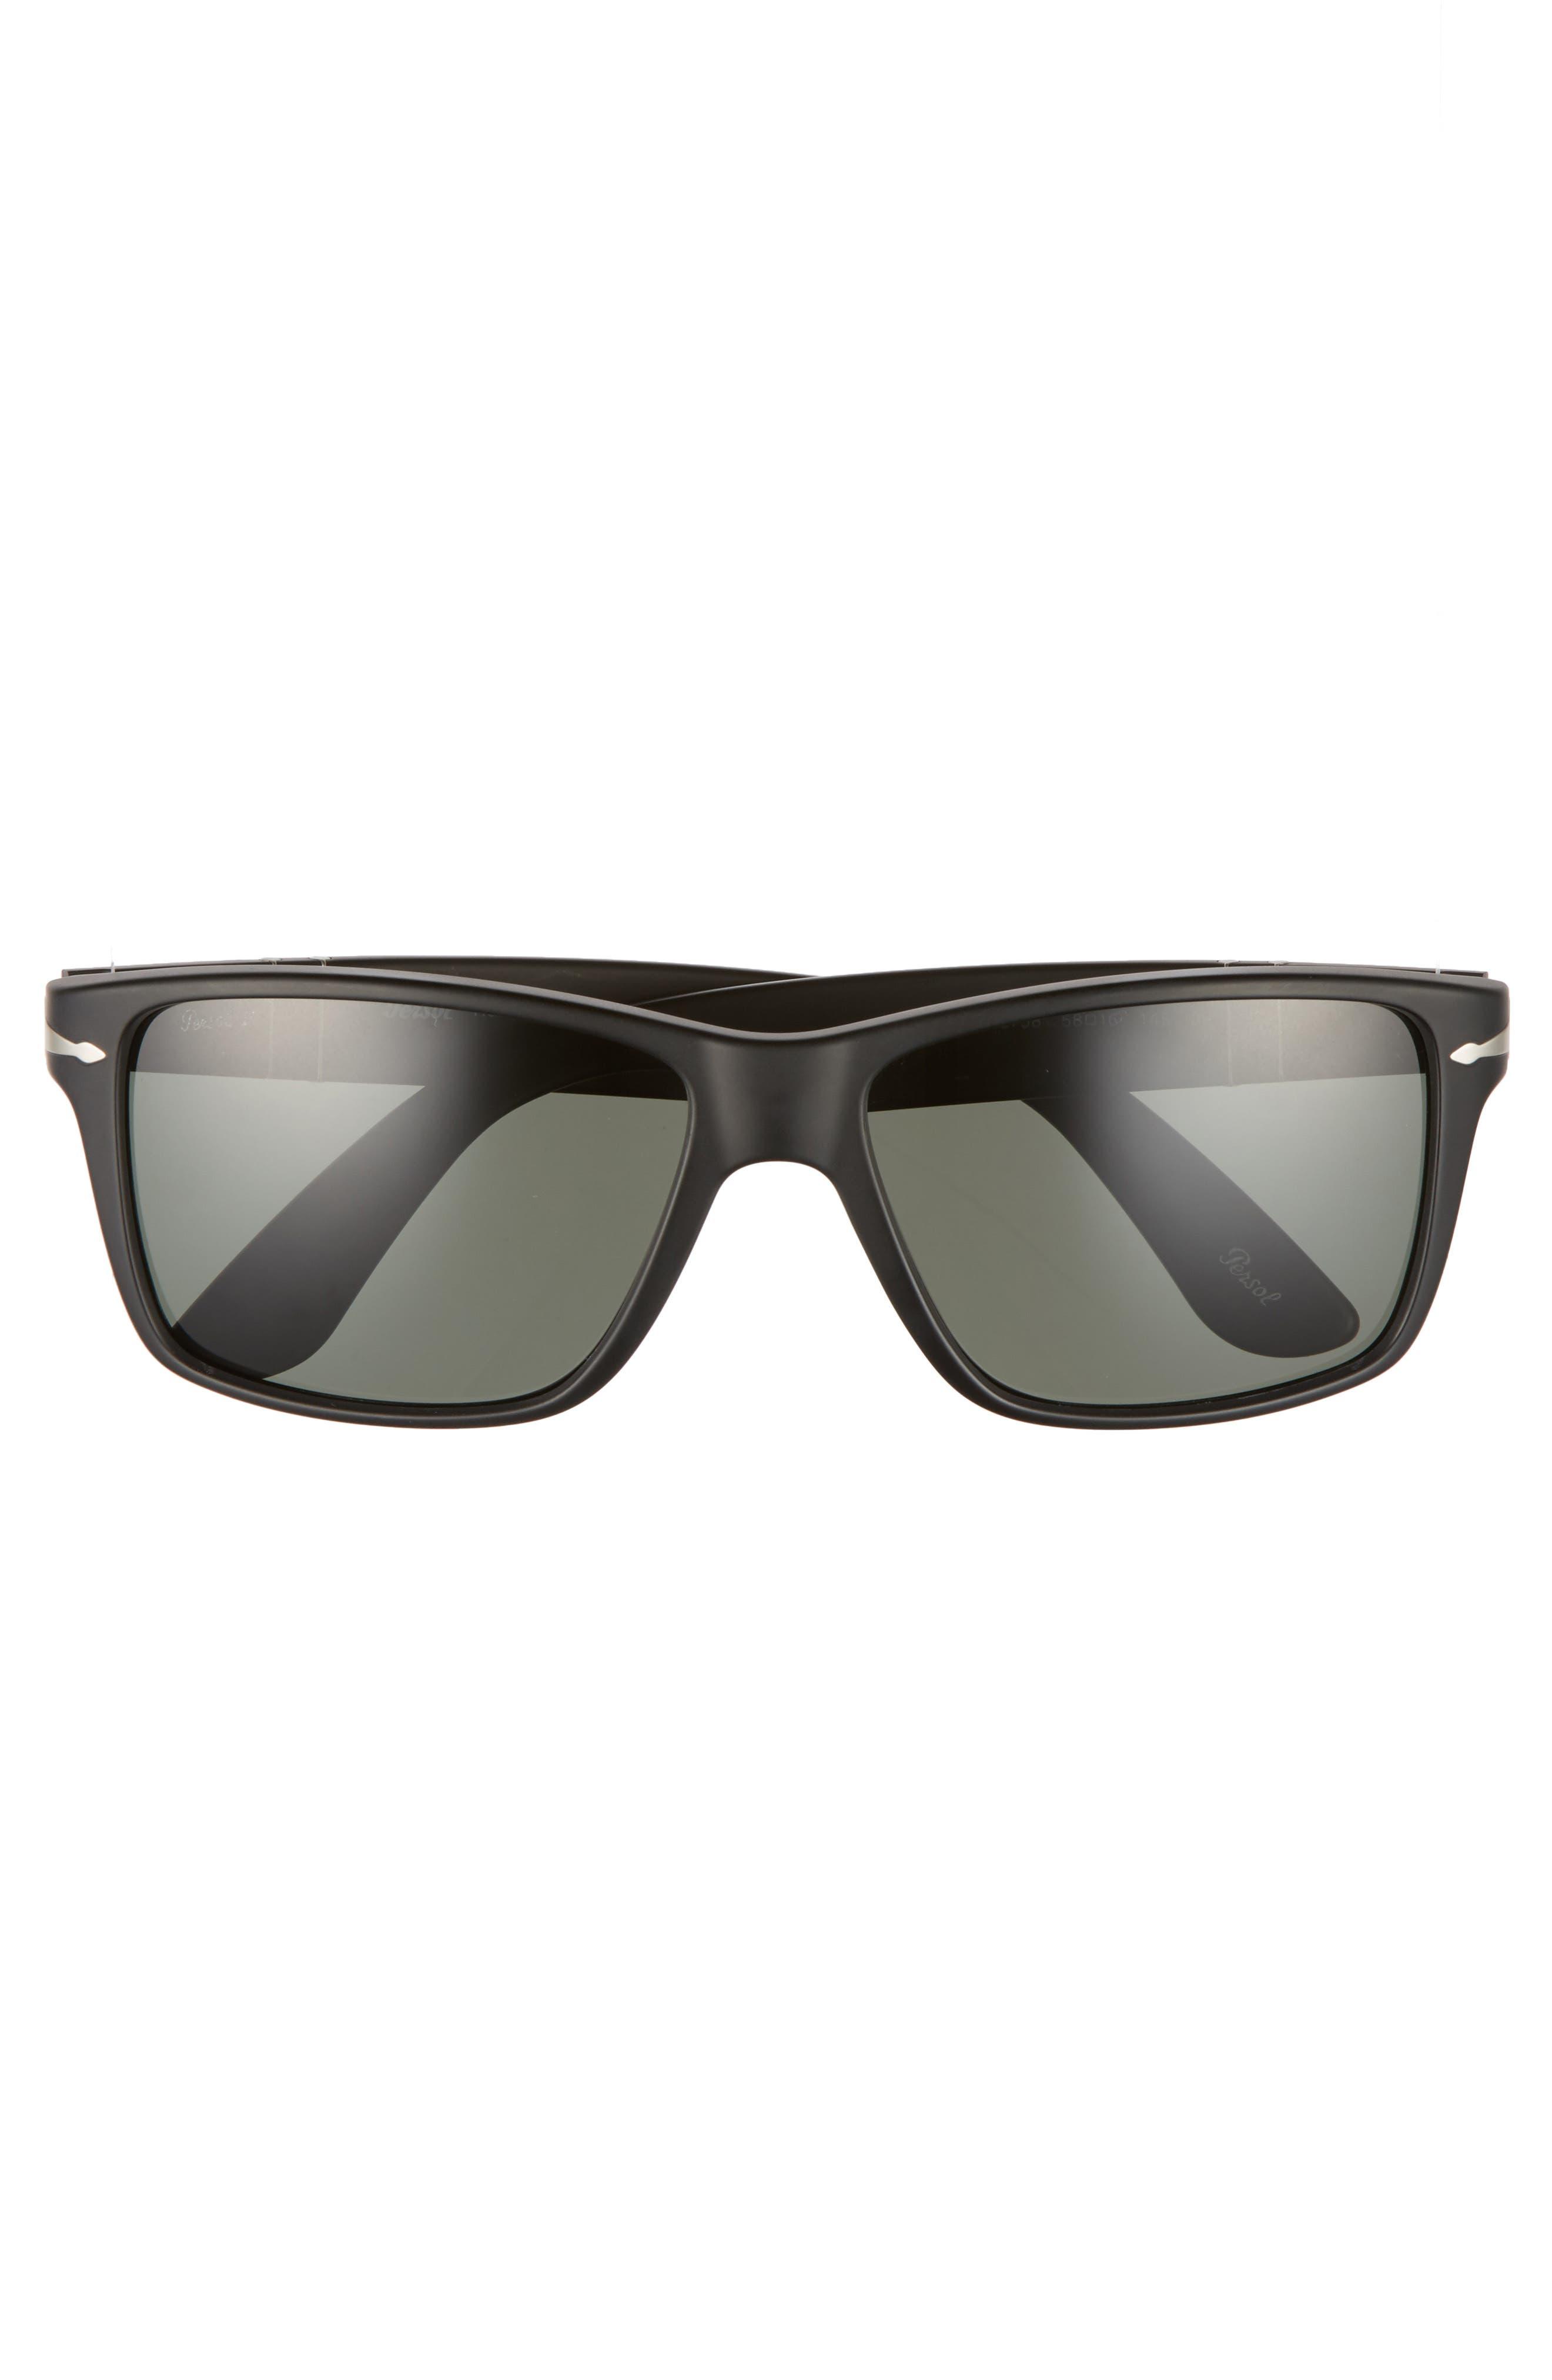 Alternate Image 2  - Persol 58mm Polarized Sunglasses